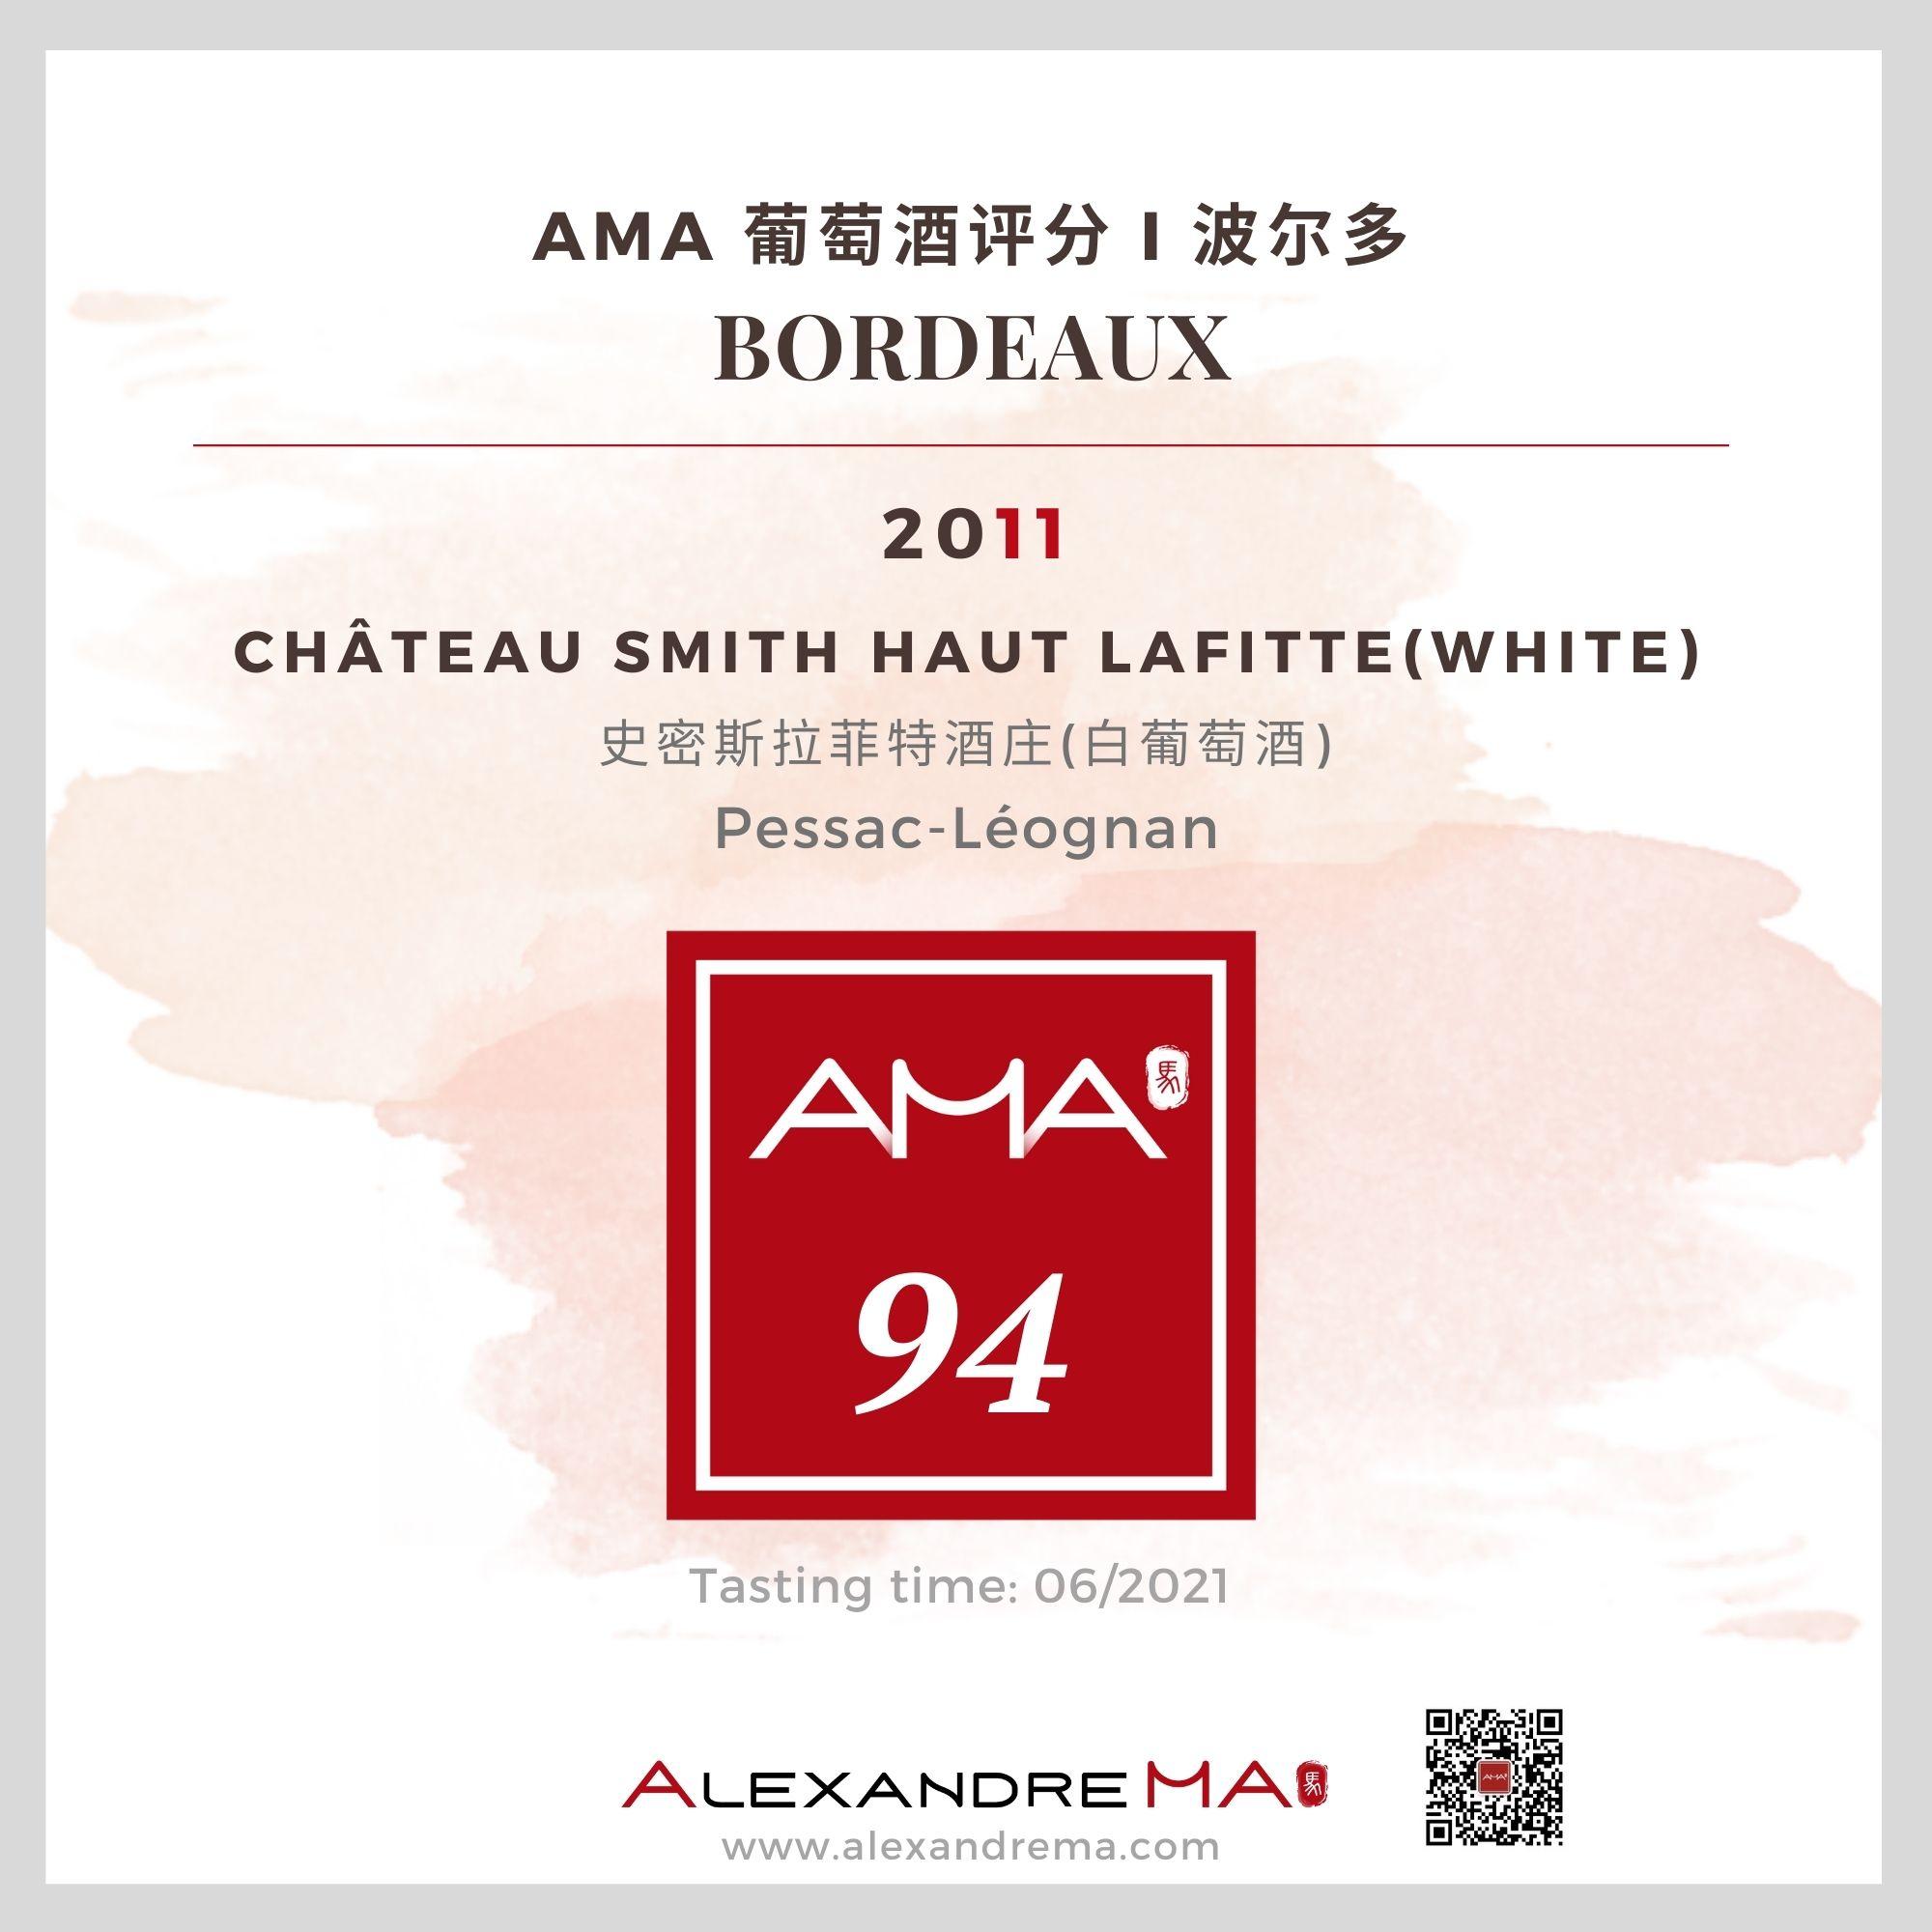 Château Smith Haut Lafitte White 2011 史密斯拉菲特酒庄 - Alexandre Ma